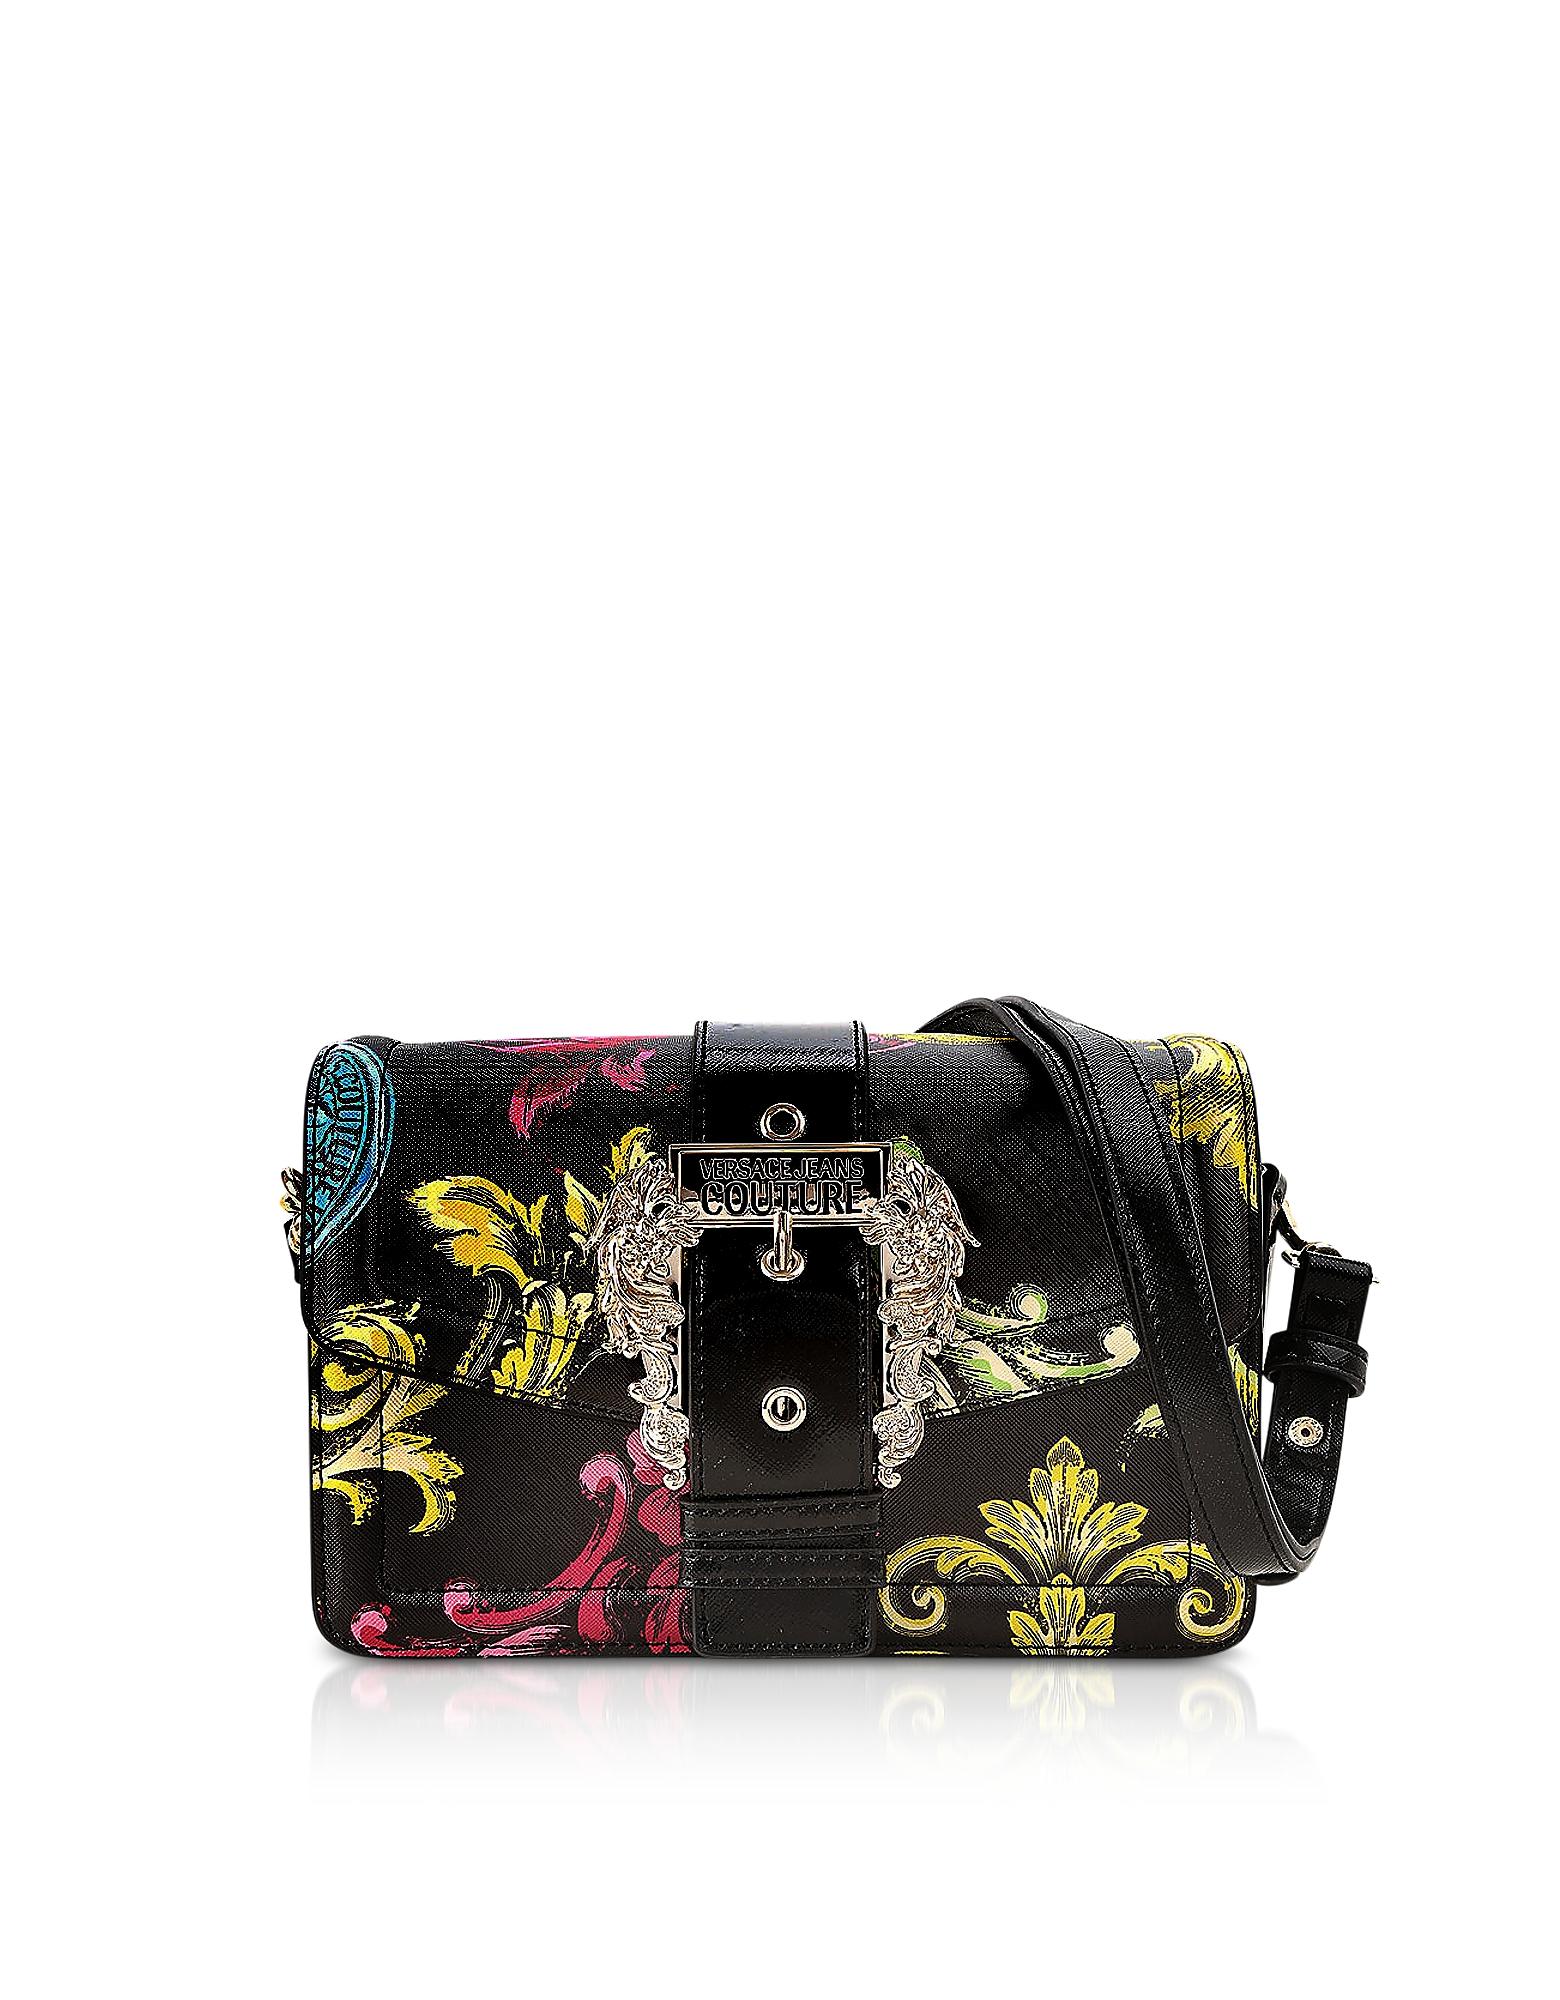 Versace Jeans Couture Designer Handbags, Black Heritage Saffiano Couture 1 Shoulder Bag